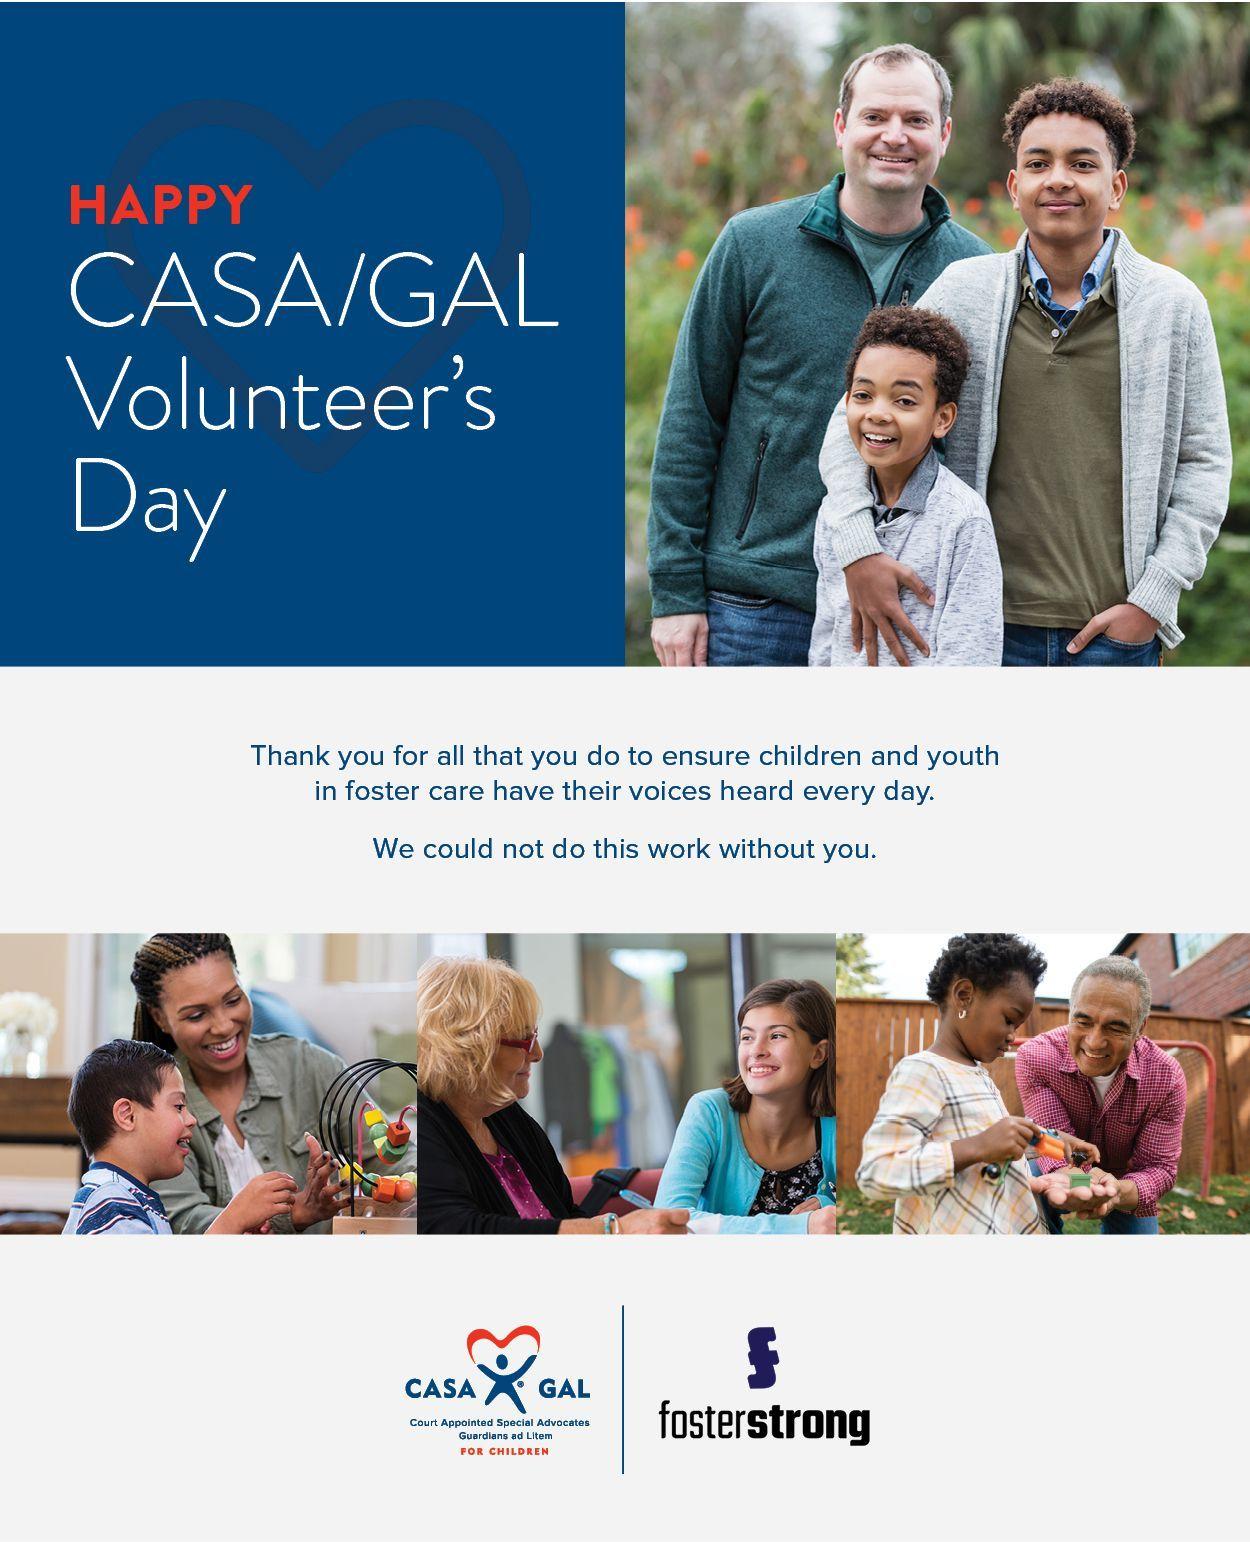 CASA/GAL Volunteer's Day May 18, 2021